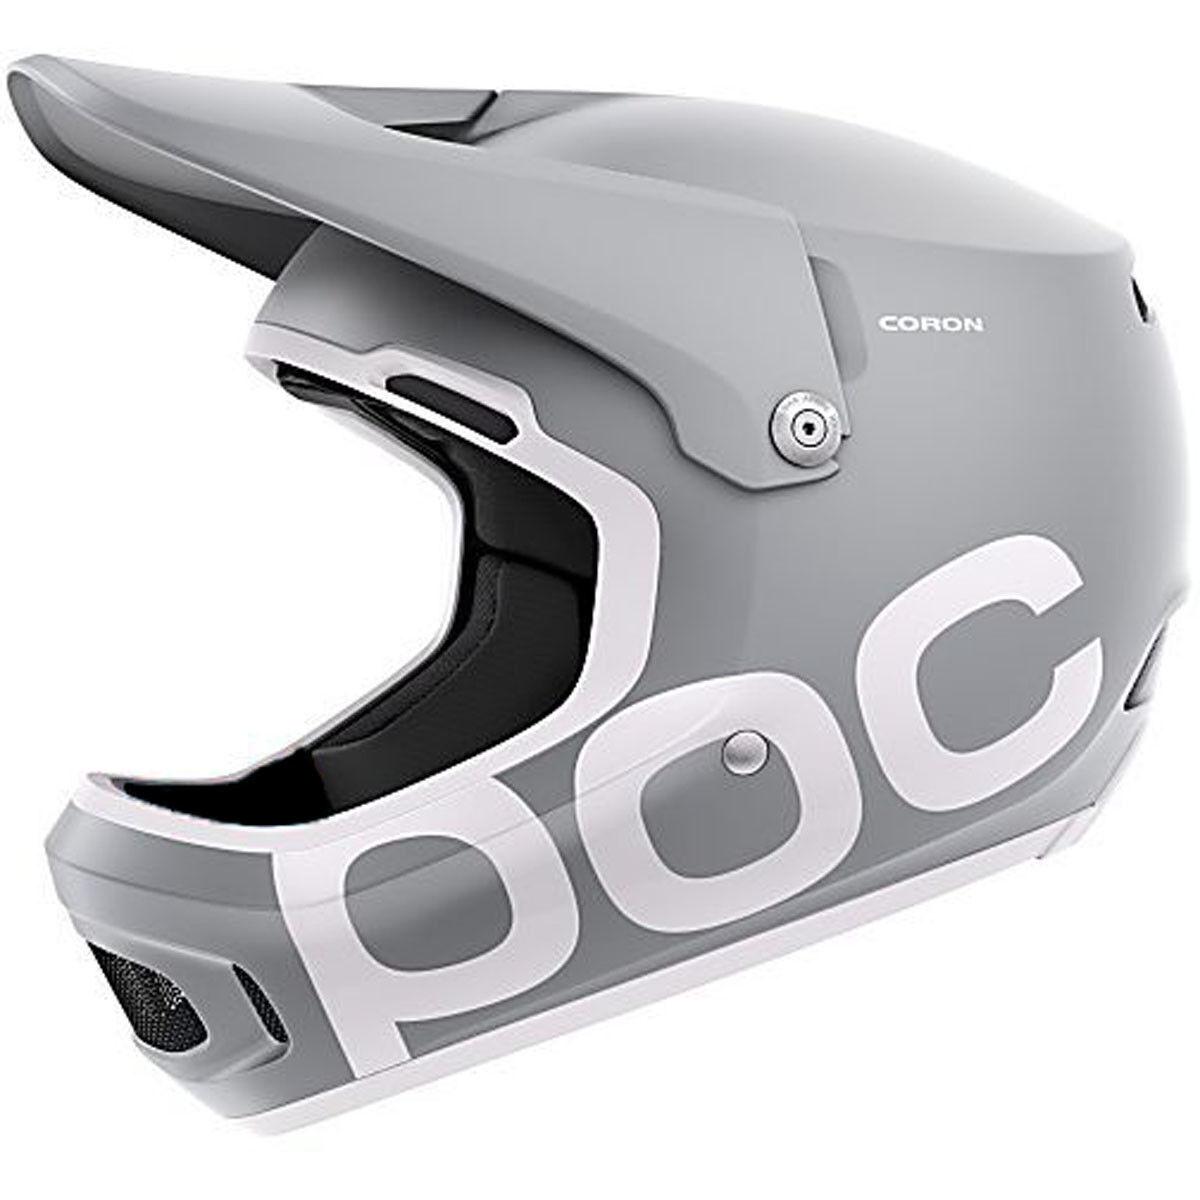 POC Cgoldn Downhill MTB Cycling Helmet Phenol Grey Medium Large M L 55 58 cm